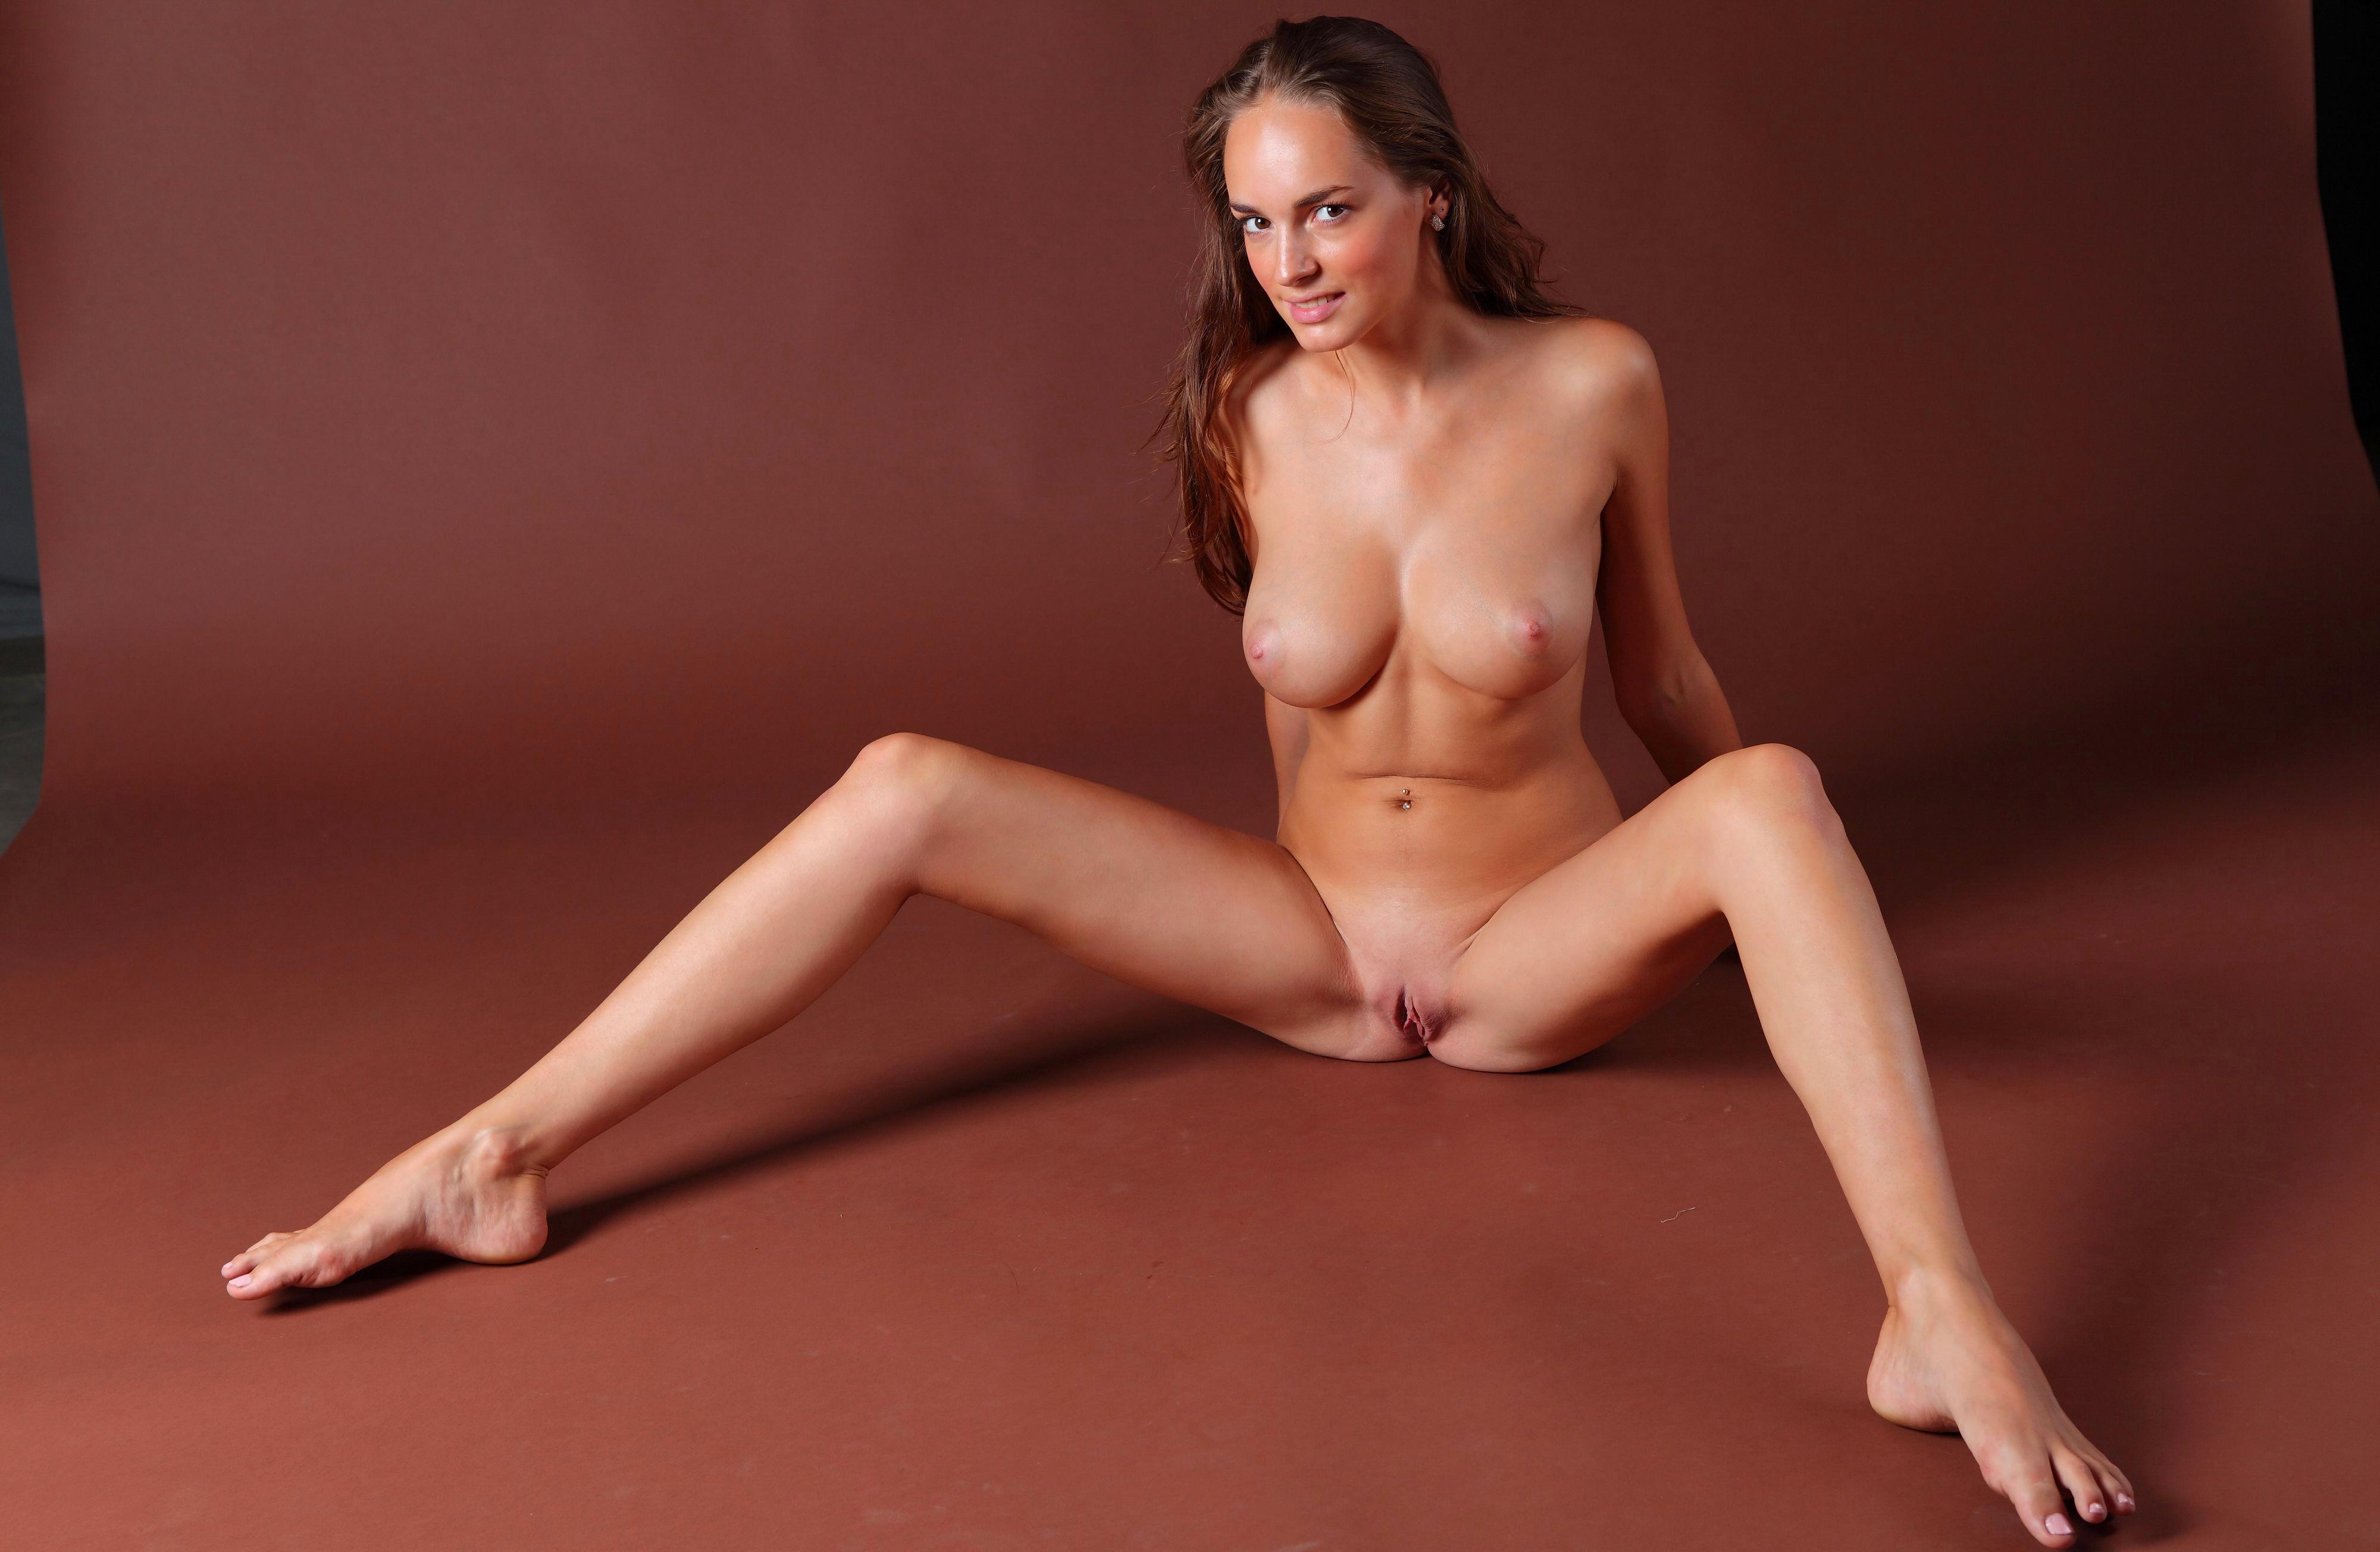 Голая девушка сидит на полу раздвинув ноги фото 741-890